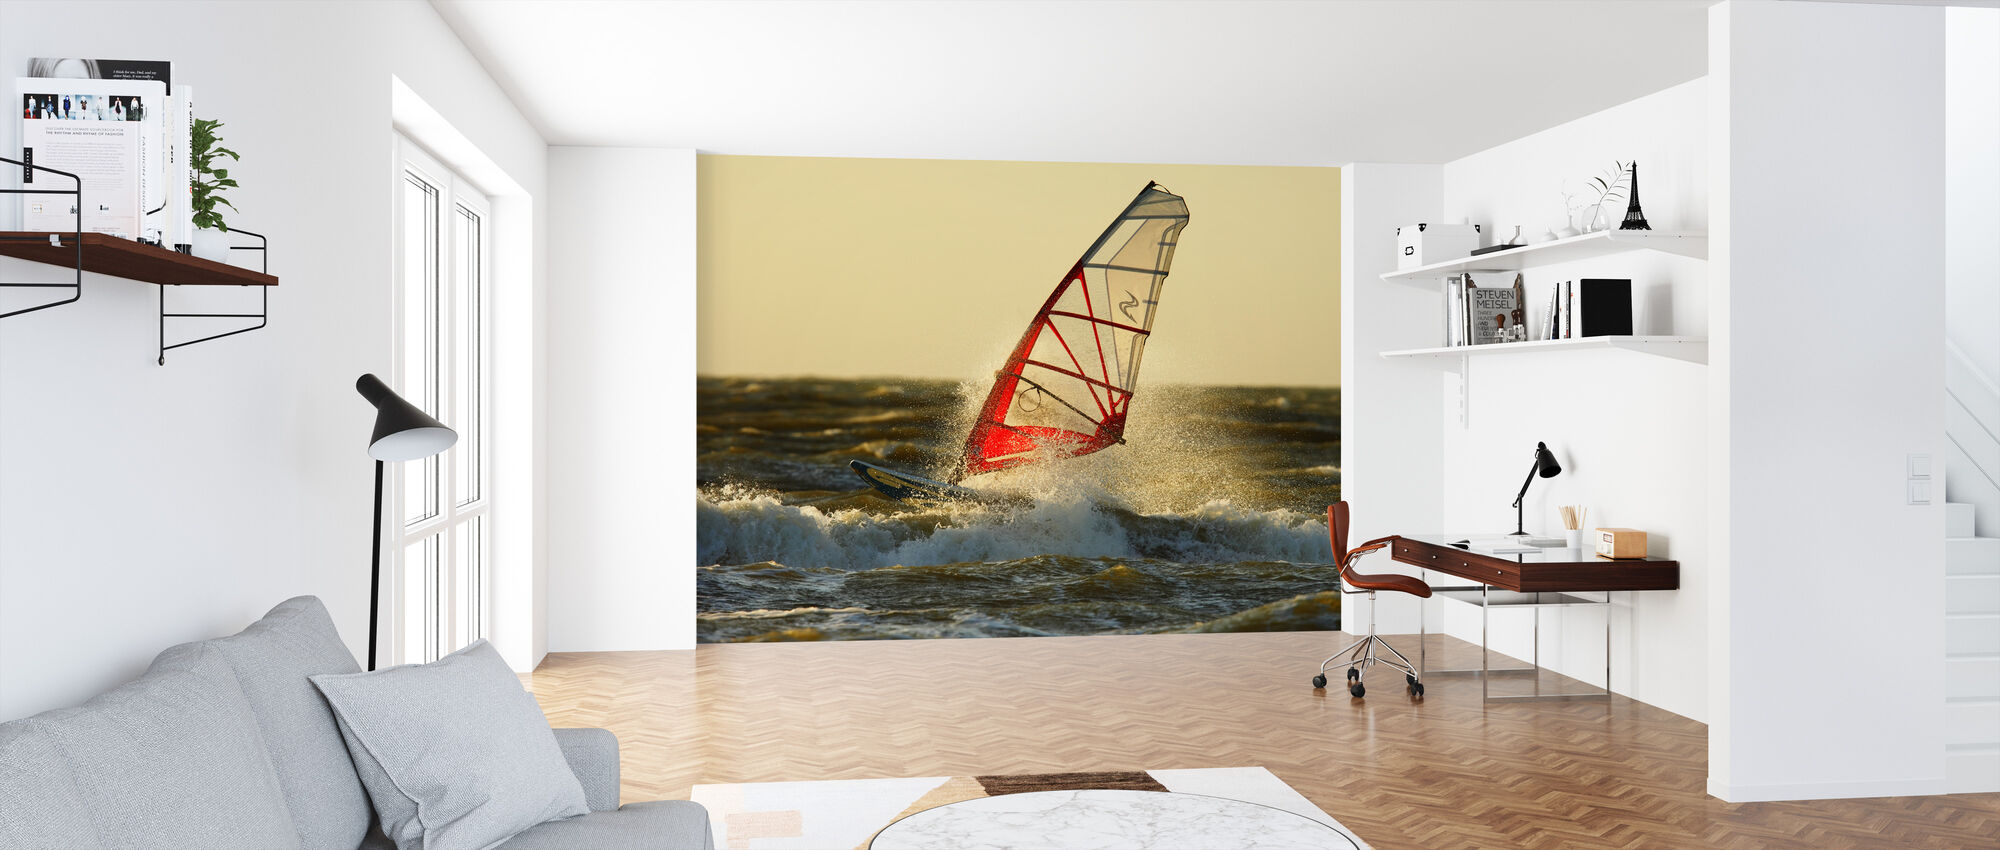 Surfing in Sweden, Europe - Wallpaper - Office